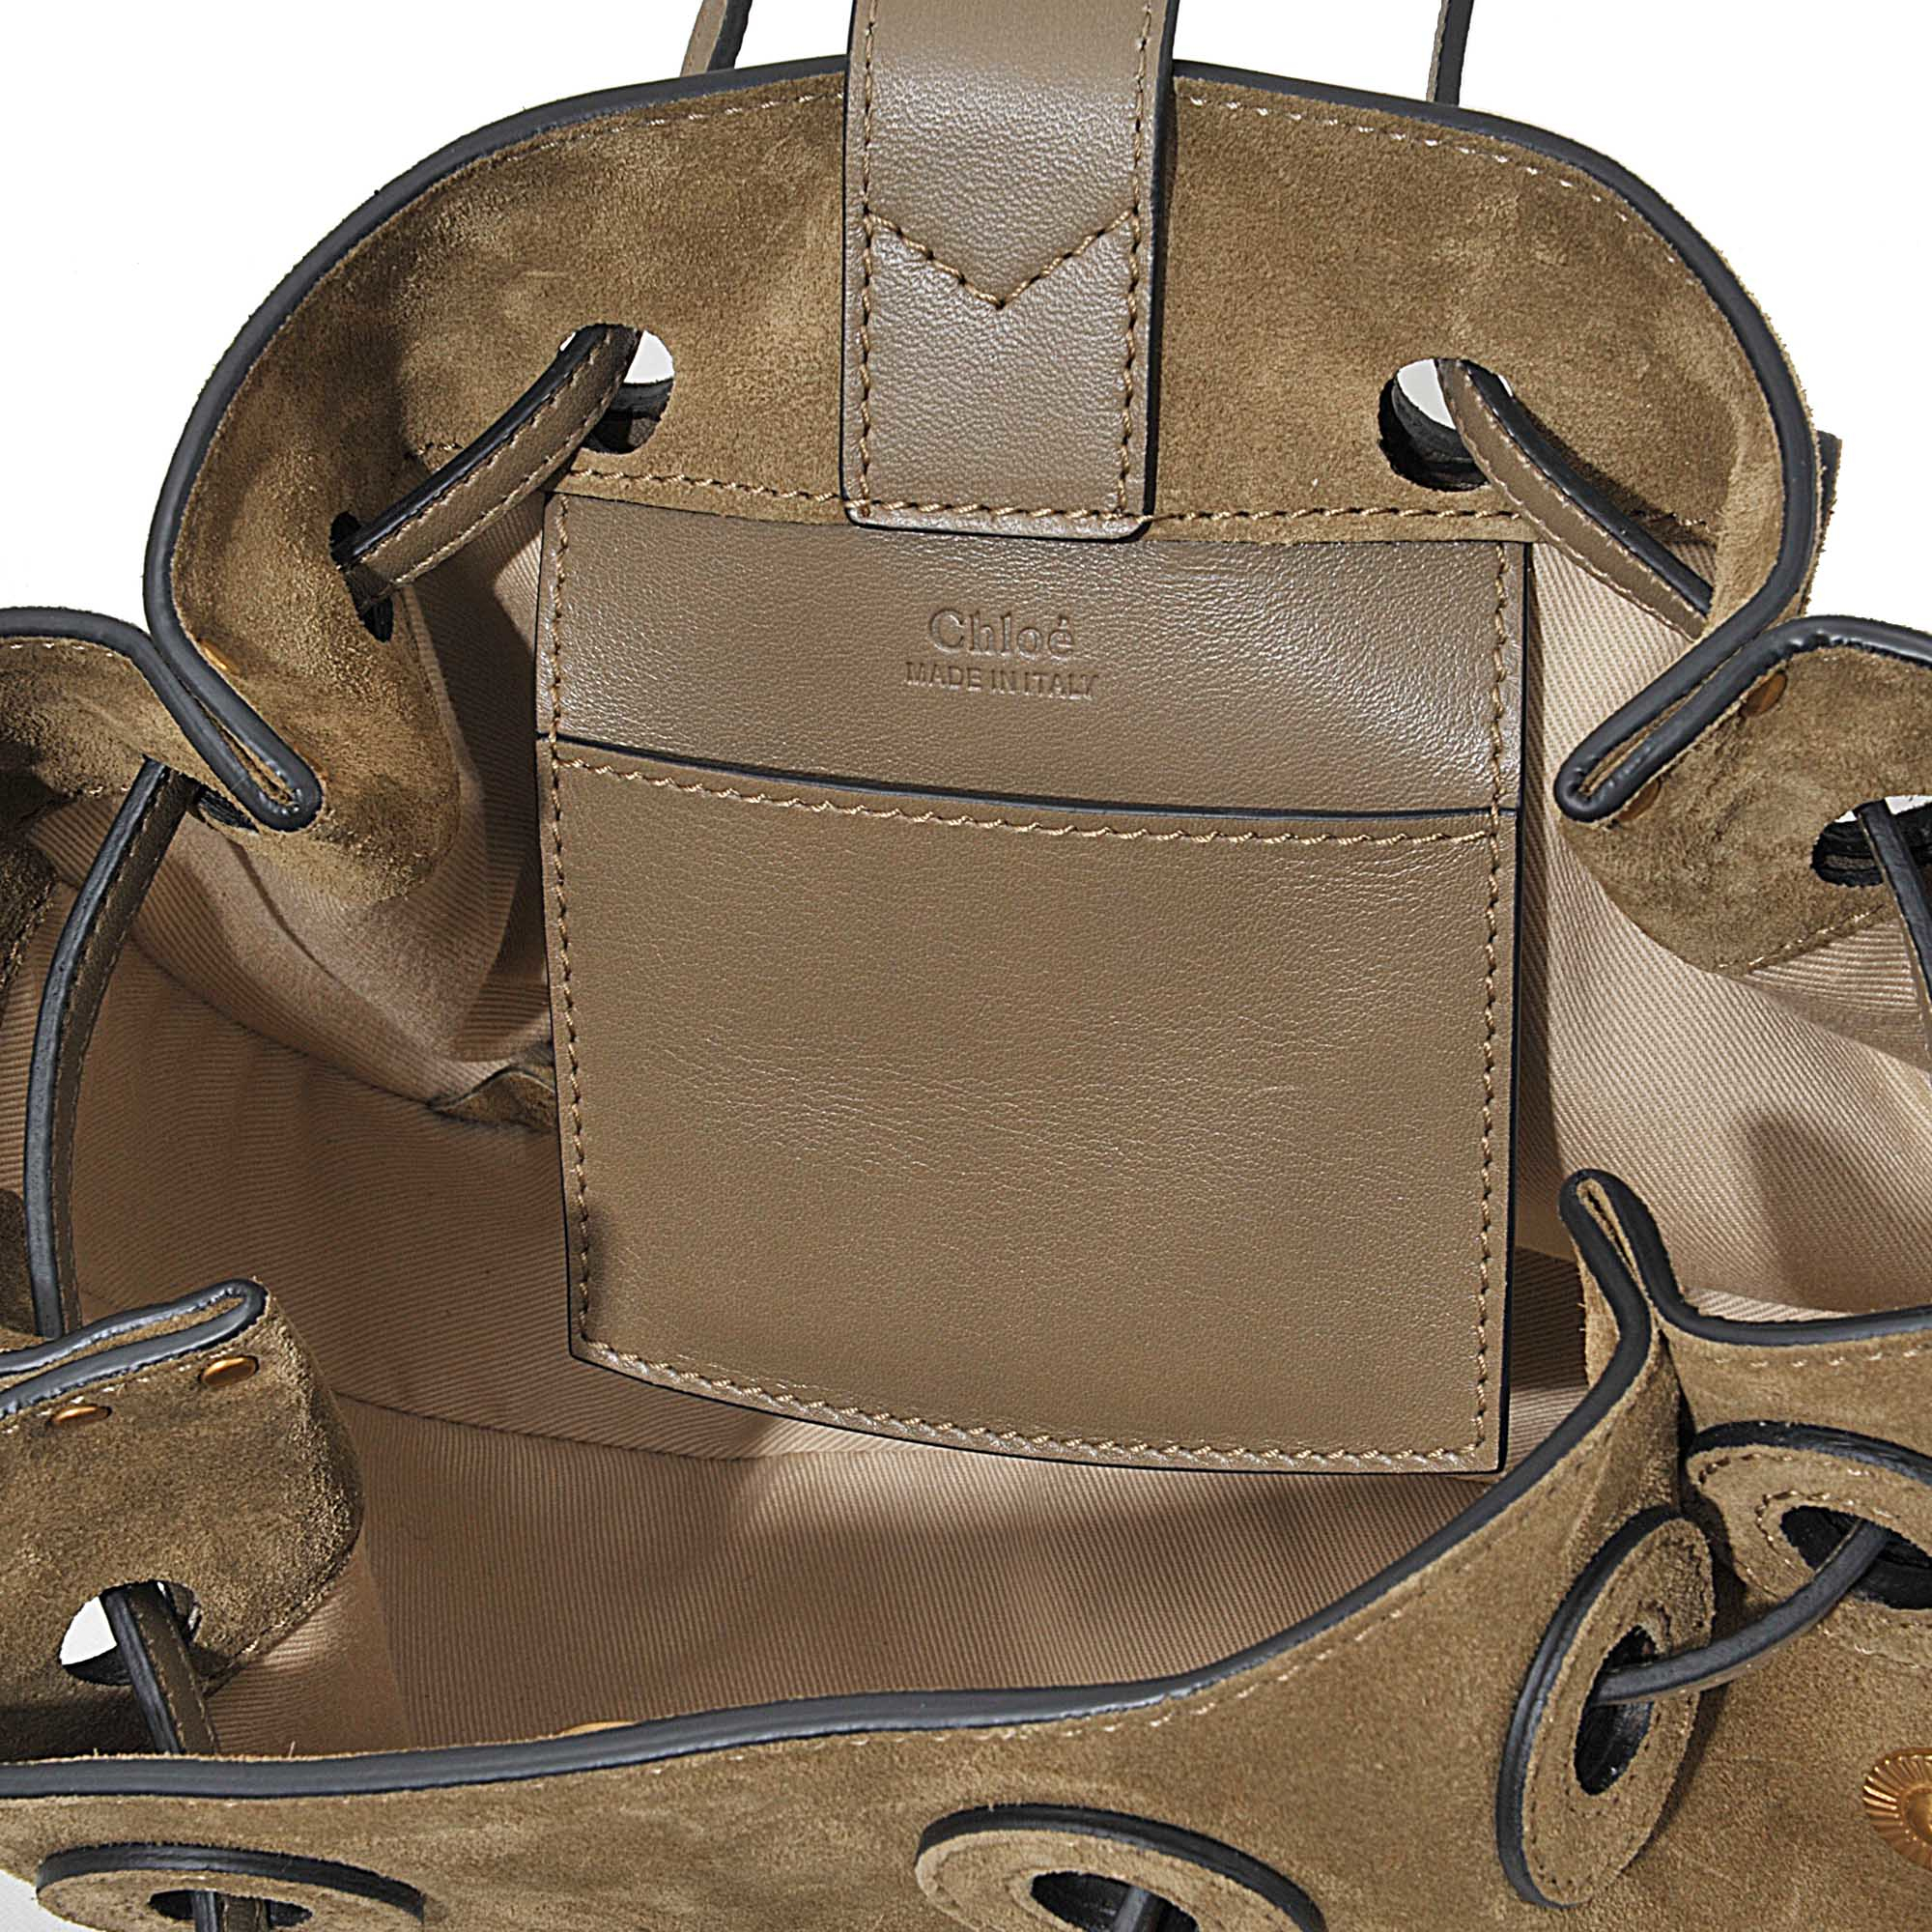 chloe bag - Chlo�� Inez Small Drawstring Bag in Brown - Save 31%   Lyst